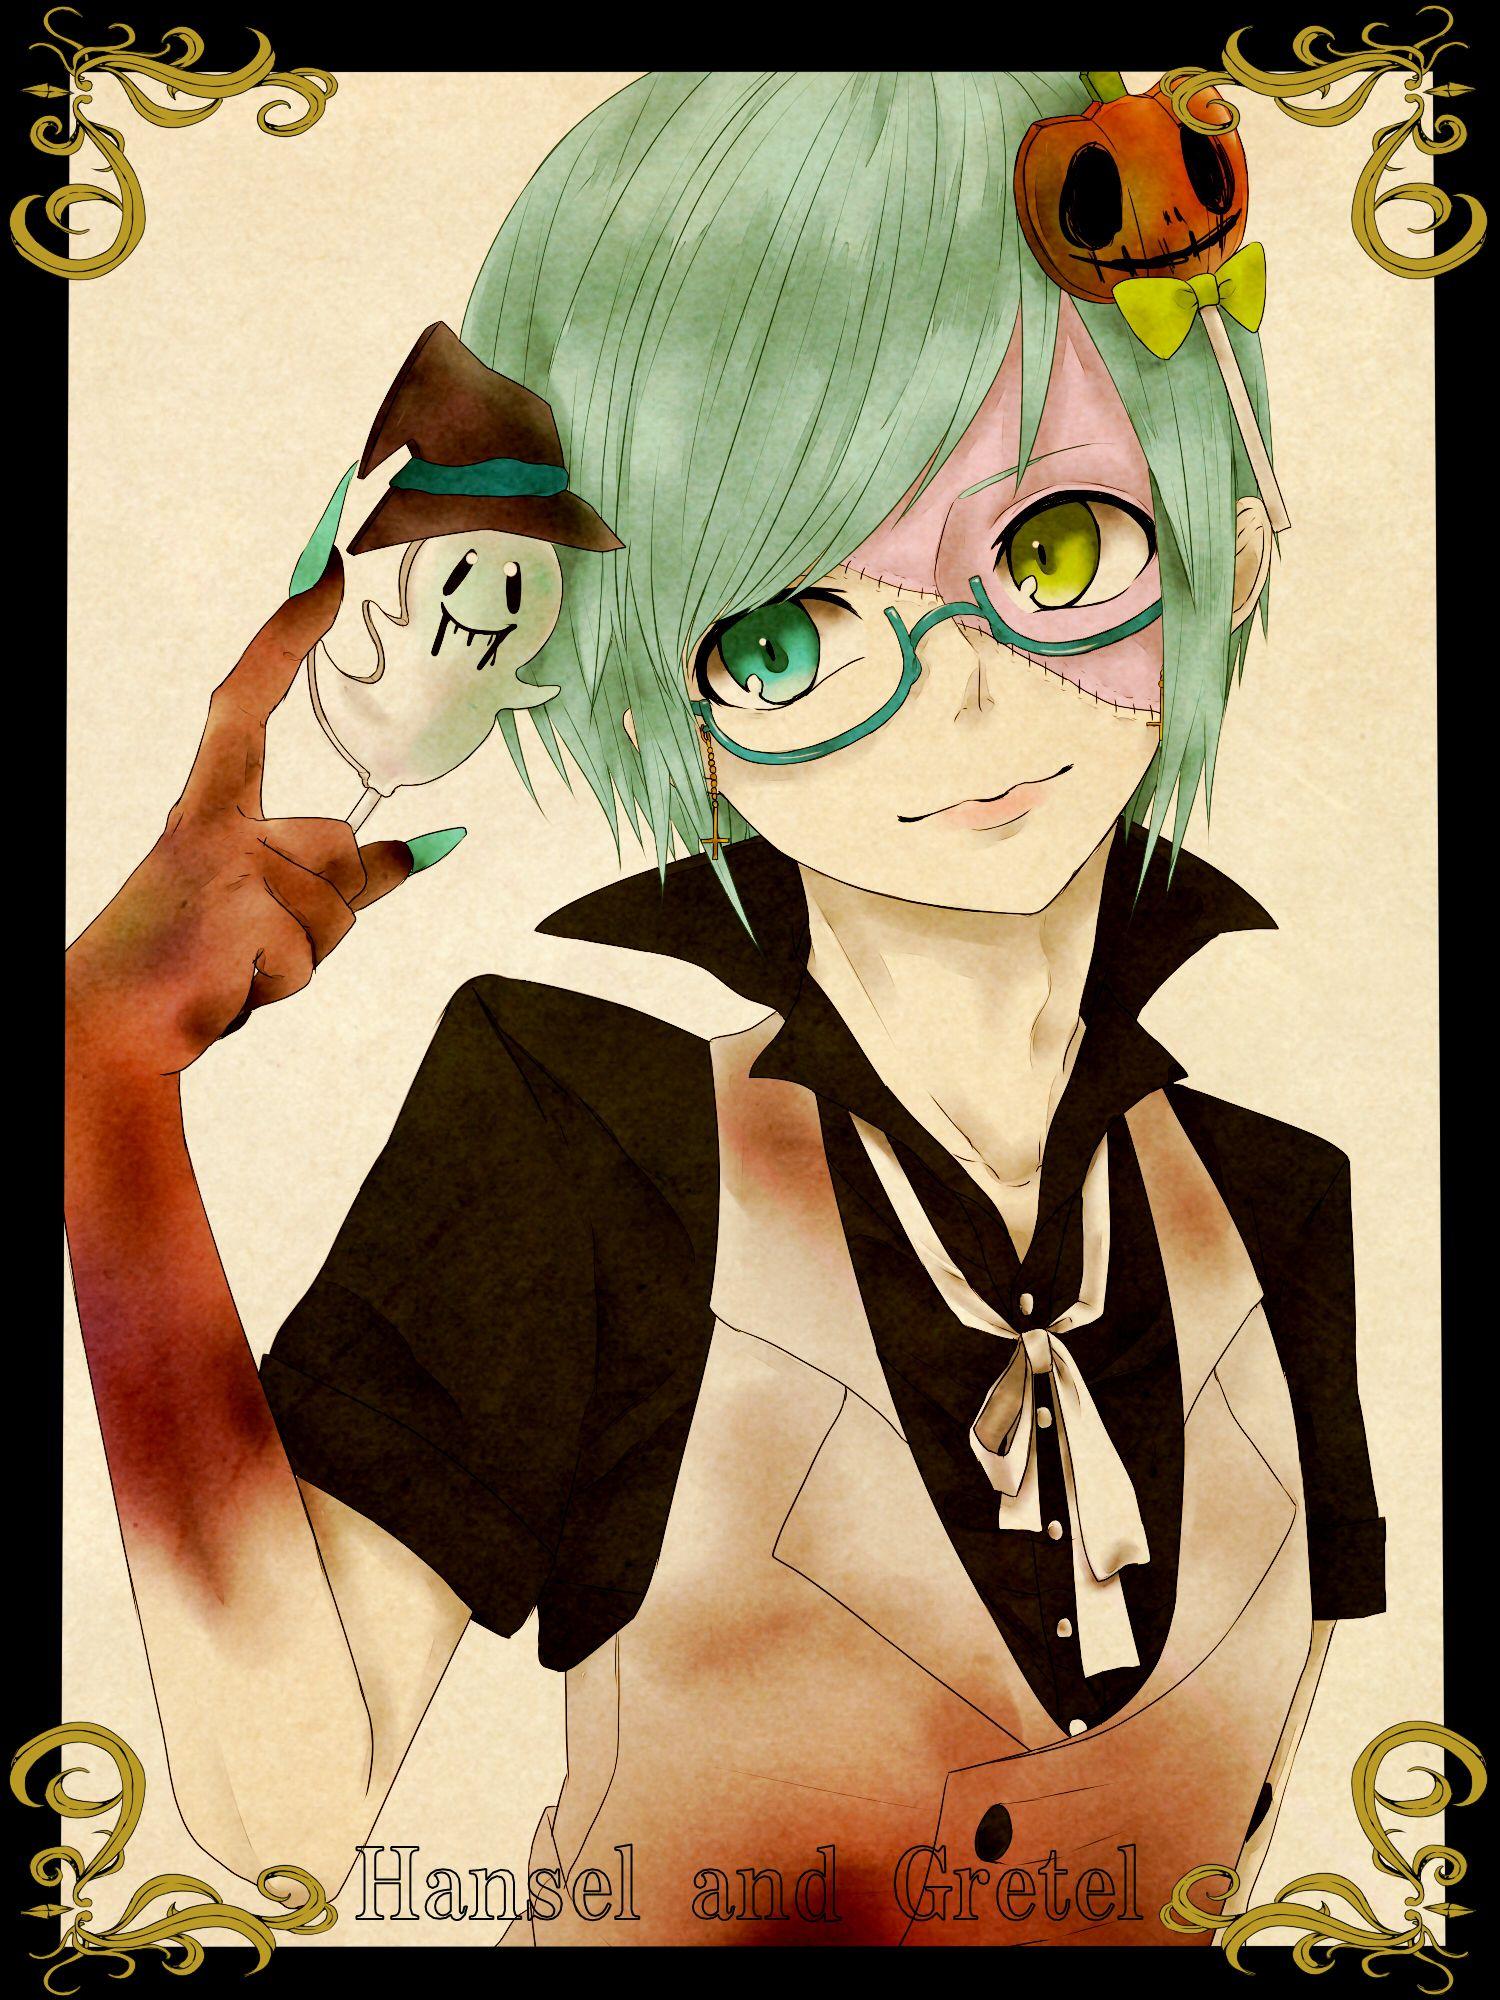 anime heterochromia / odd eyes blue green (Sniffles Happy